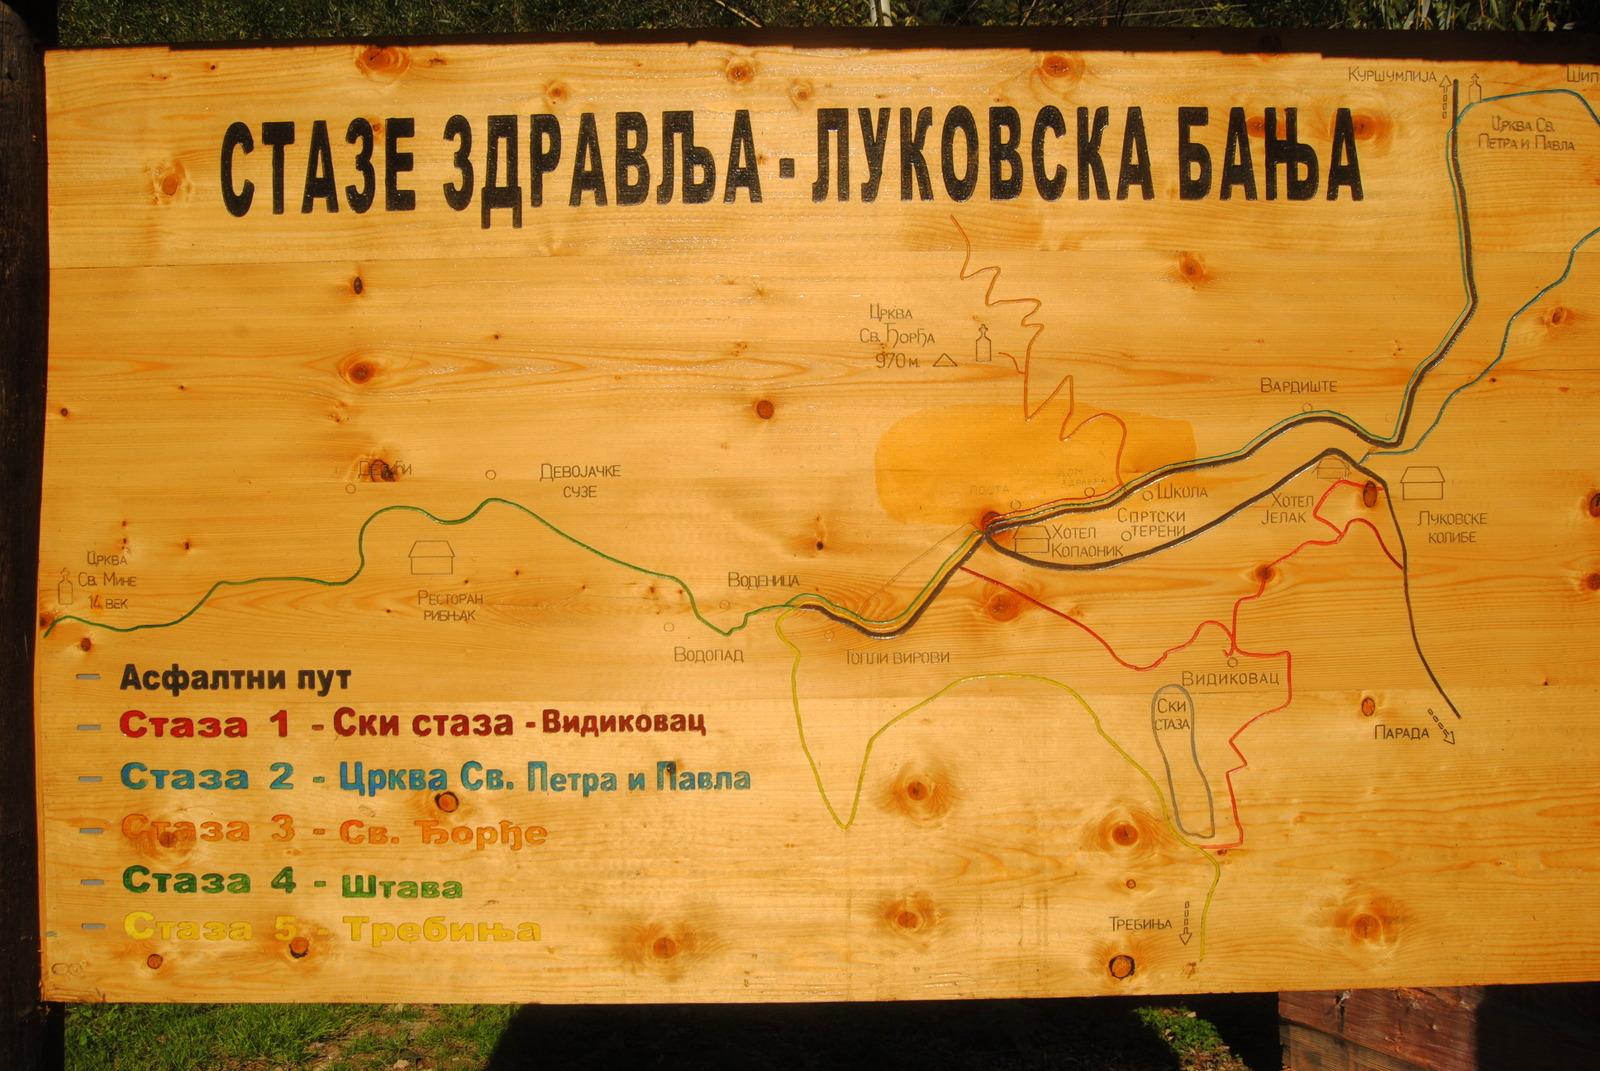 Lukovska Banja staze zdravlja